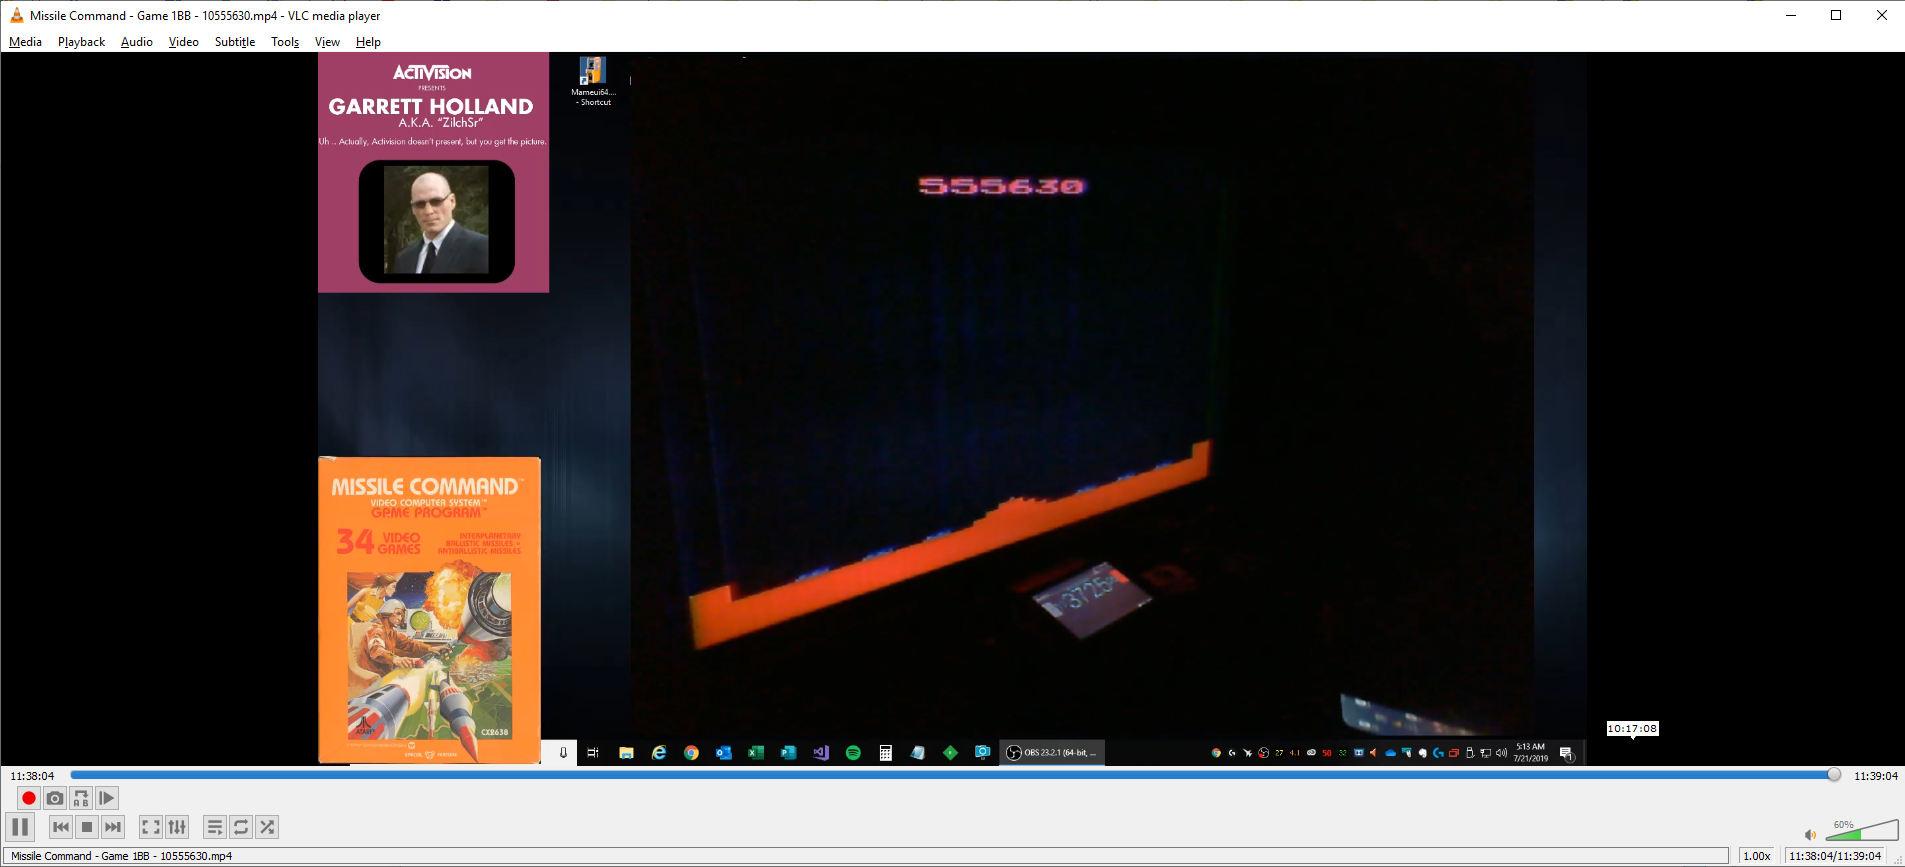 ZilchSr: Missile Command (Atari 2600 Novice/B) 10,555,630 points on 2019-08-08 20:50:26